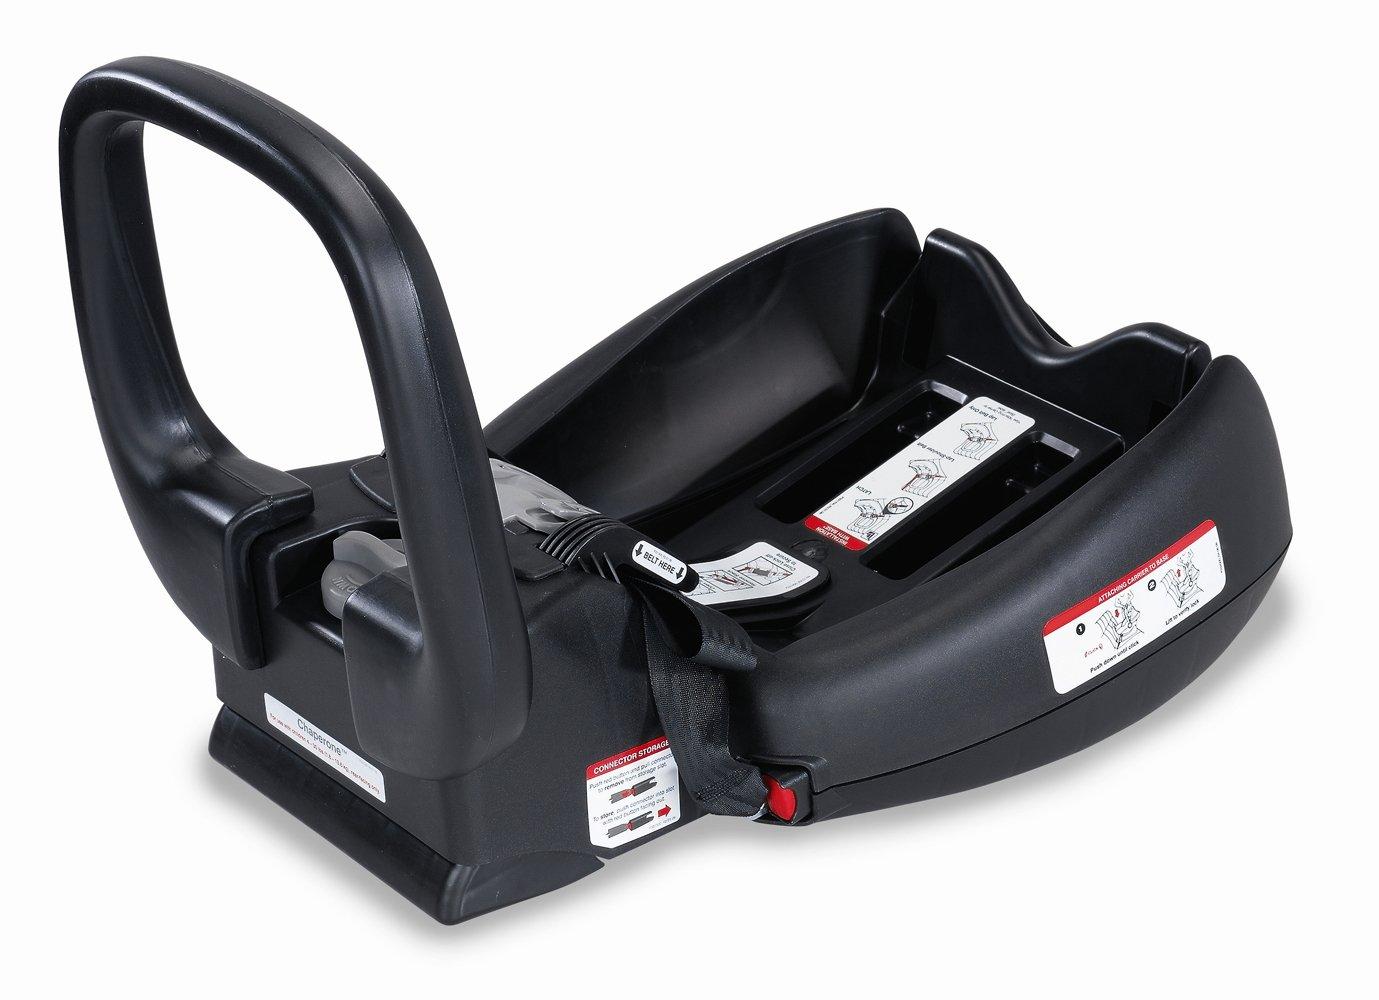 Britax Chaperone Infant Car Seat Base Kit, Black (Prior Model) S841100